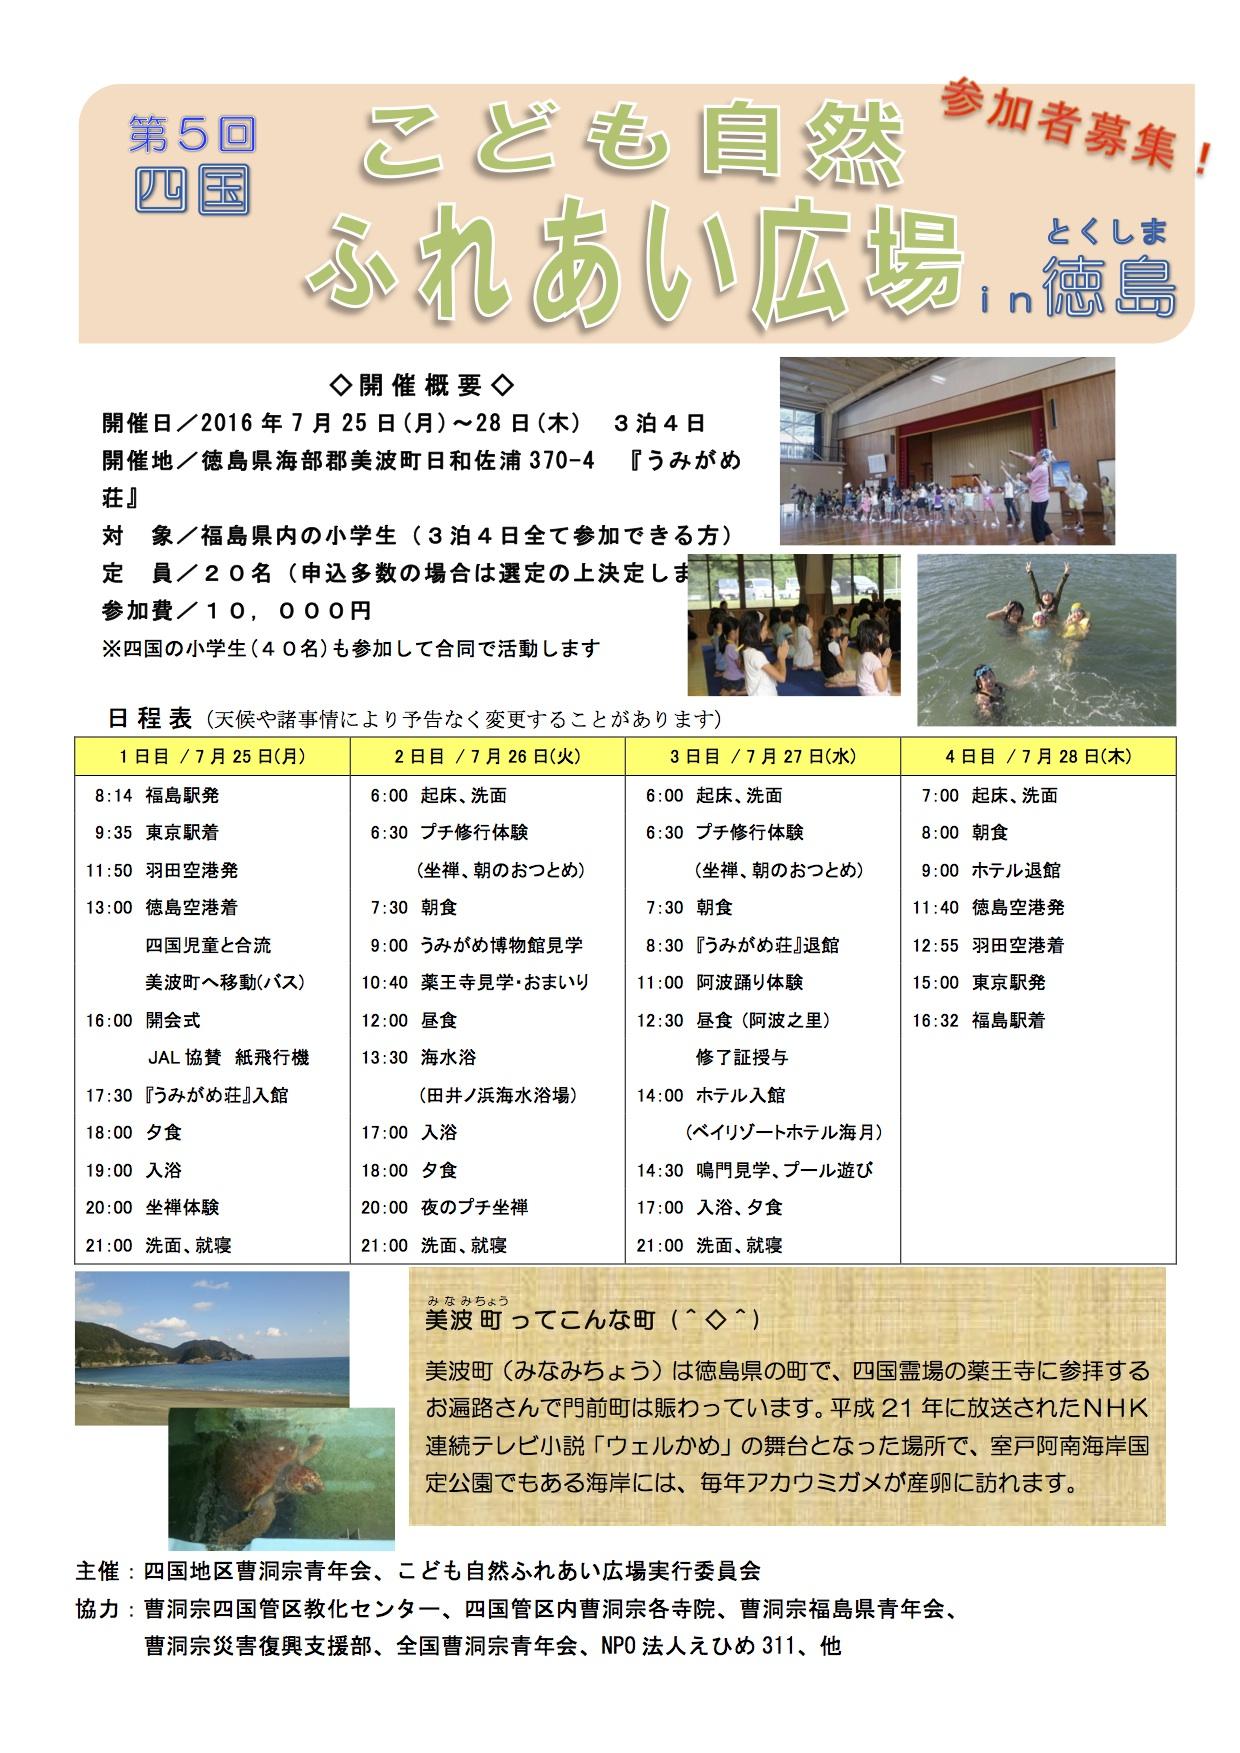 J 第5回福島児童募集チラシ (7) 申込なし